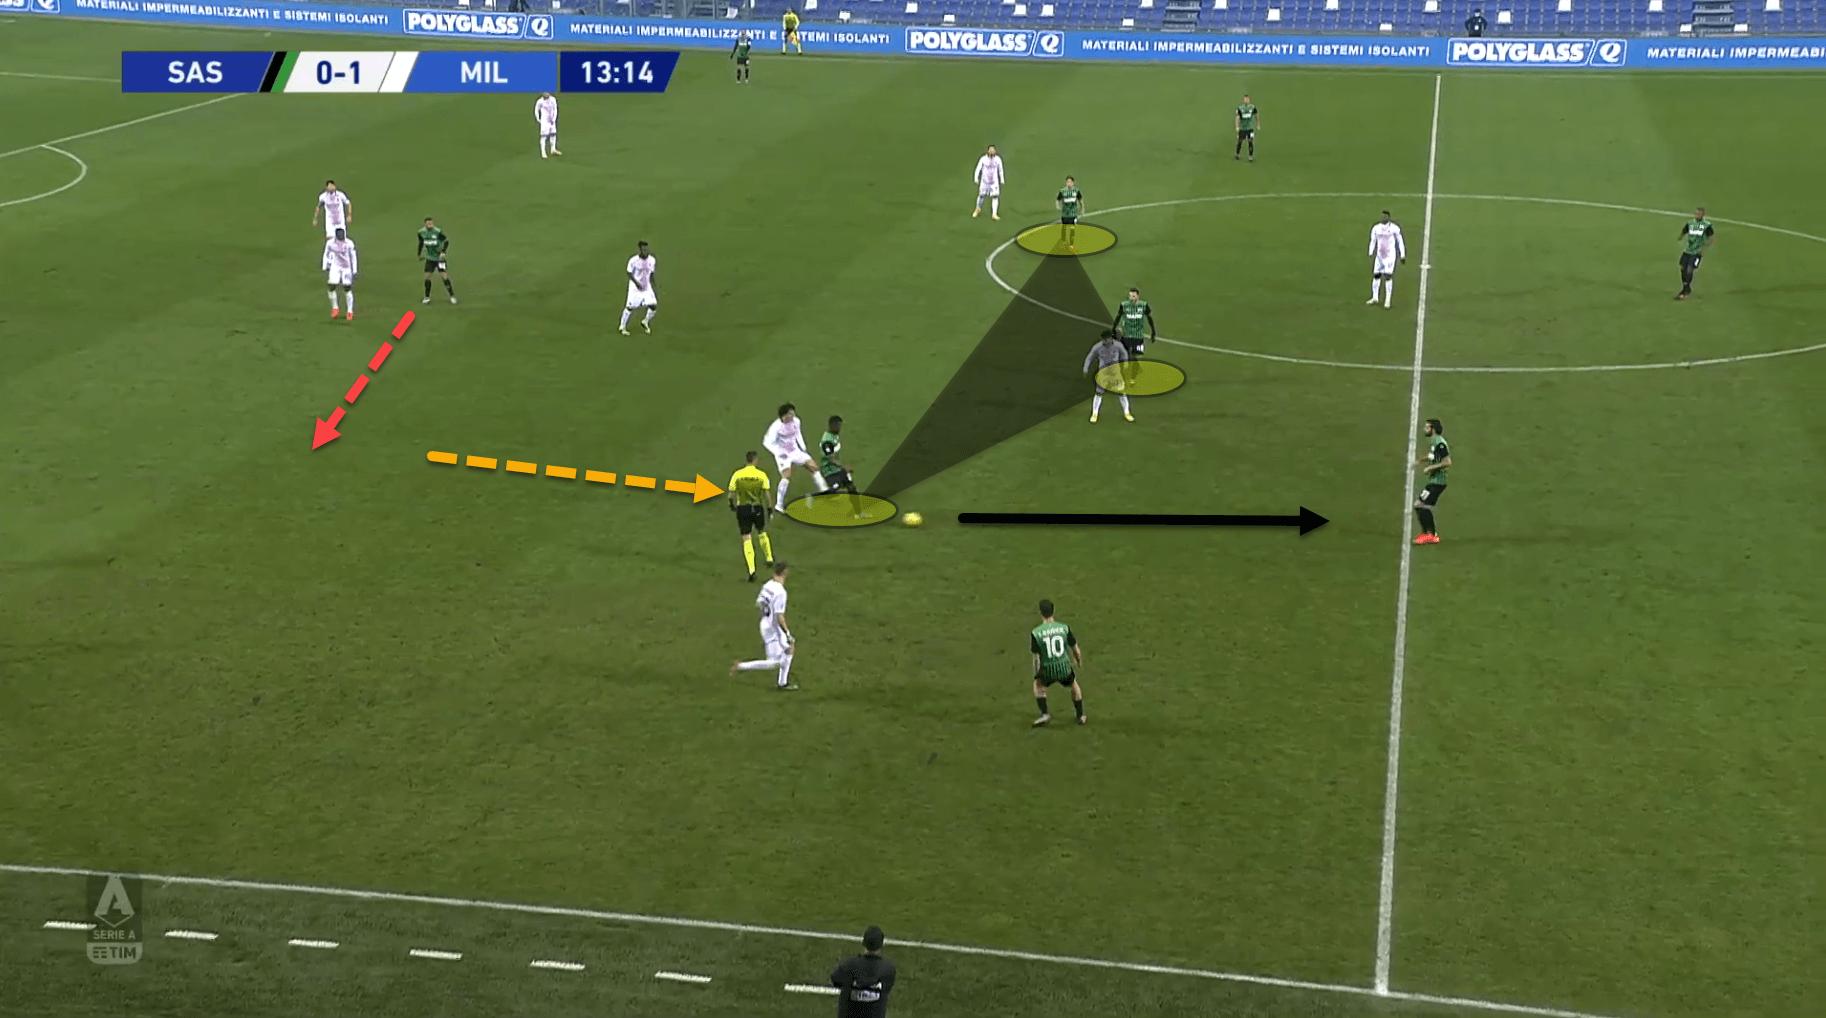 Serie A 2020/21: Sassuolo vs Milan - tactical analysis tactics